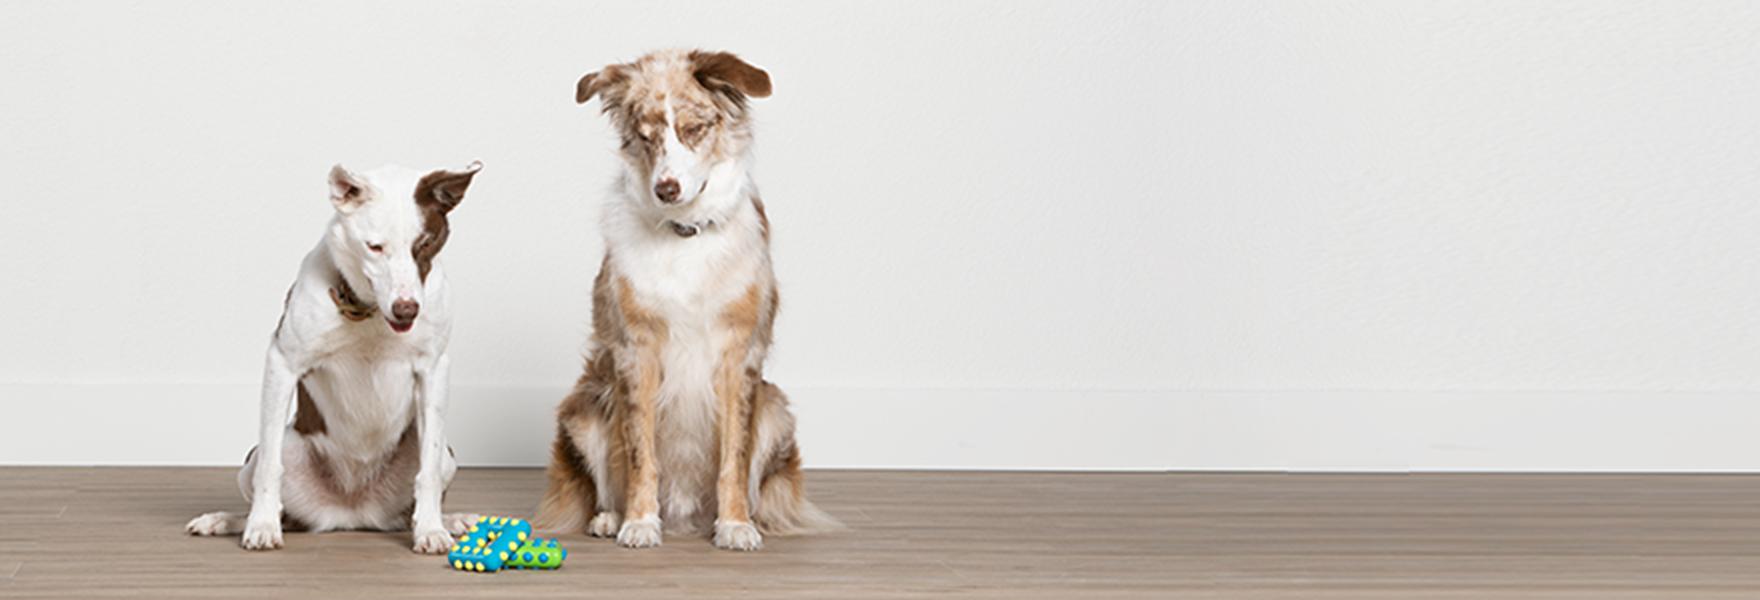 Dog Training: Puppy and Adult Dog Training Classes   PetSmart